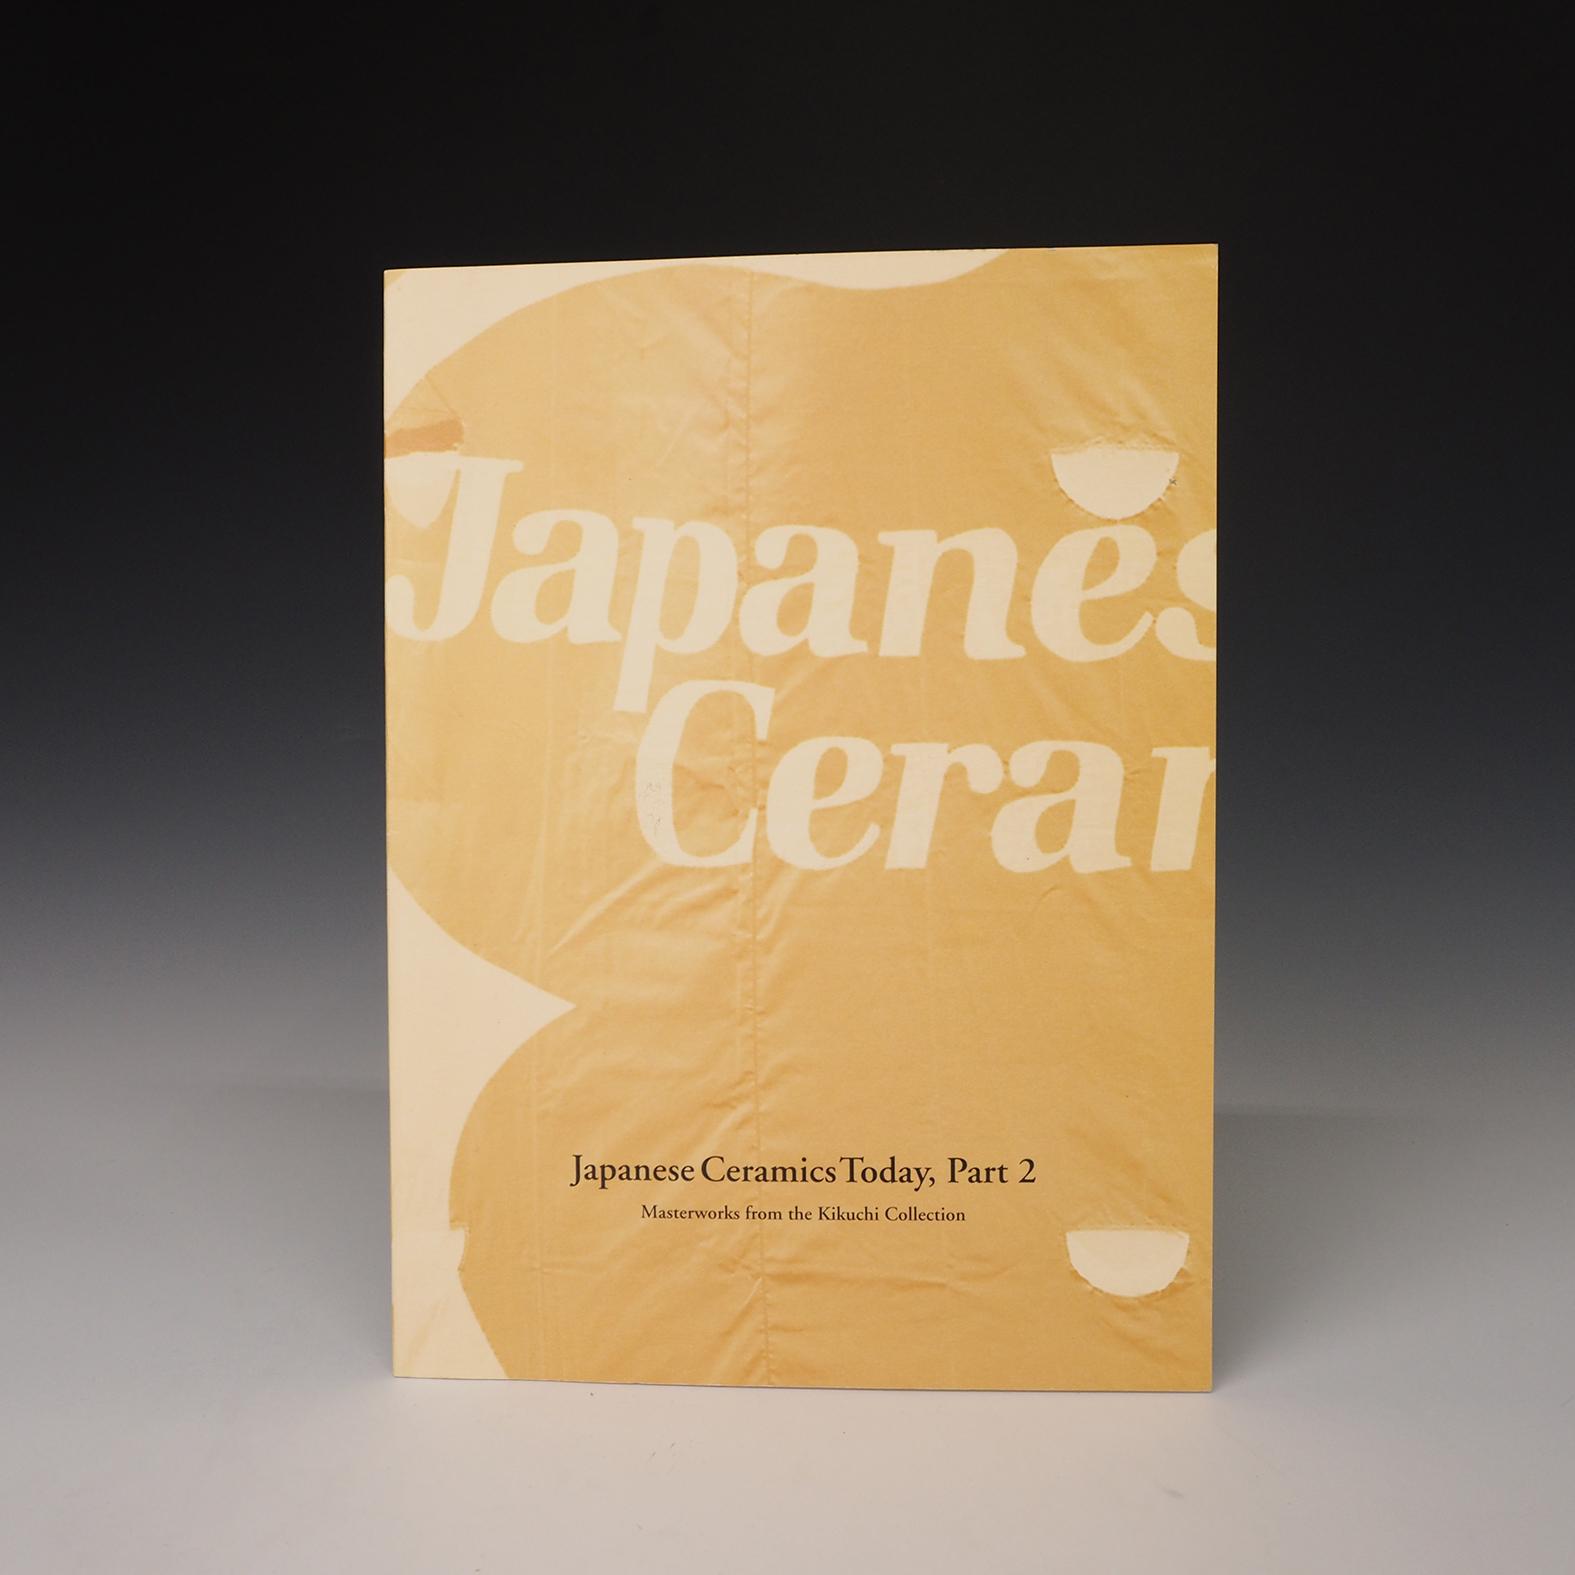 "Japanese Ceramics Today, Part 1: Masterworks from the Kikuchi Collection    Musee Tomo, 2003. 11 ¼""x 8 ¼"", 121 pp.The catalogue features color images of 100 pieces of contemporary works such as by Sueharu Fukami, Kyo Tsuji, Kimiaki Takeuchi, Shugo Takauchi, Tatsuzo Shimaoka, Kakiemon XIV Sakaida, Yasokichi Tokuda, Toshisada Wakao, Mineo Okabe, Koheiji Miura, Seimei Tsuji, Shinobu Kawase, etc. Forward by Seizo Hayashiya, director of the museum, and an essay by curator, Mari Hanazato, both in English and Japanese. Artists' biographies in Japanese."